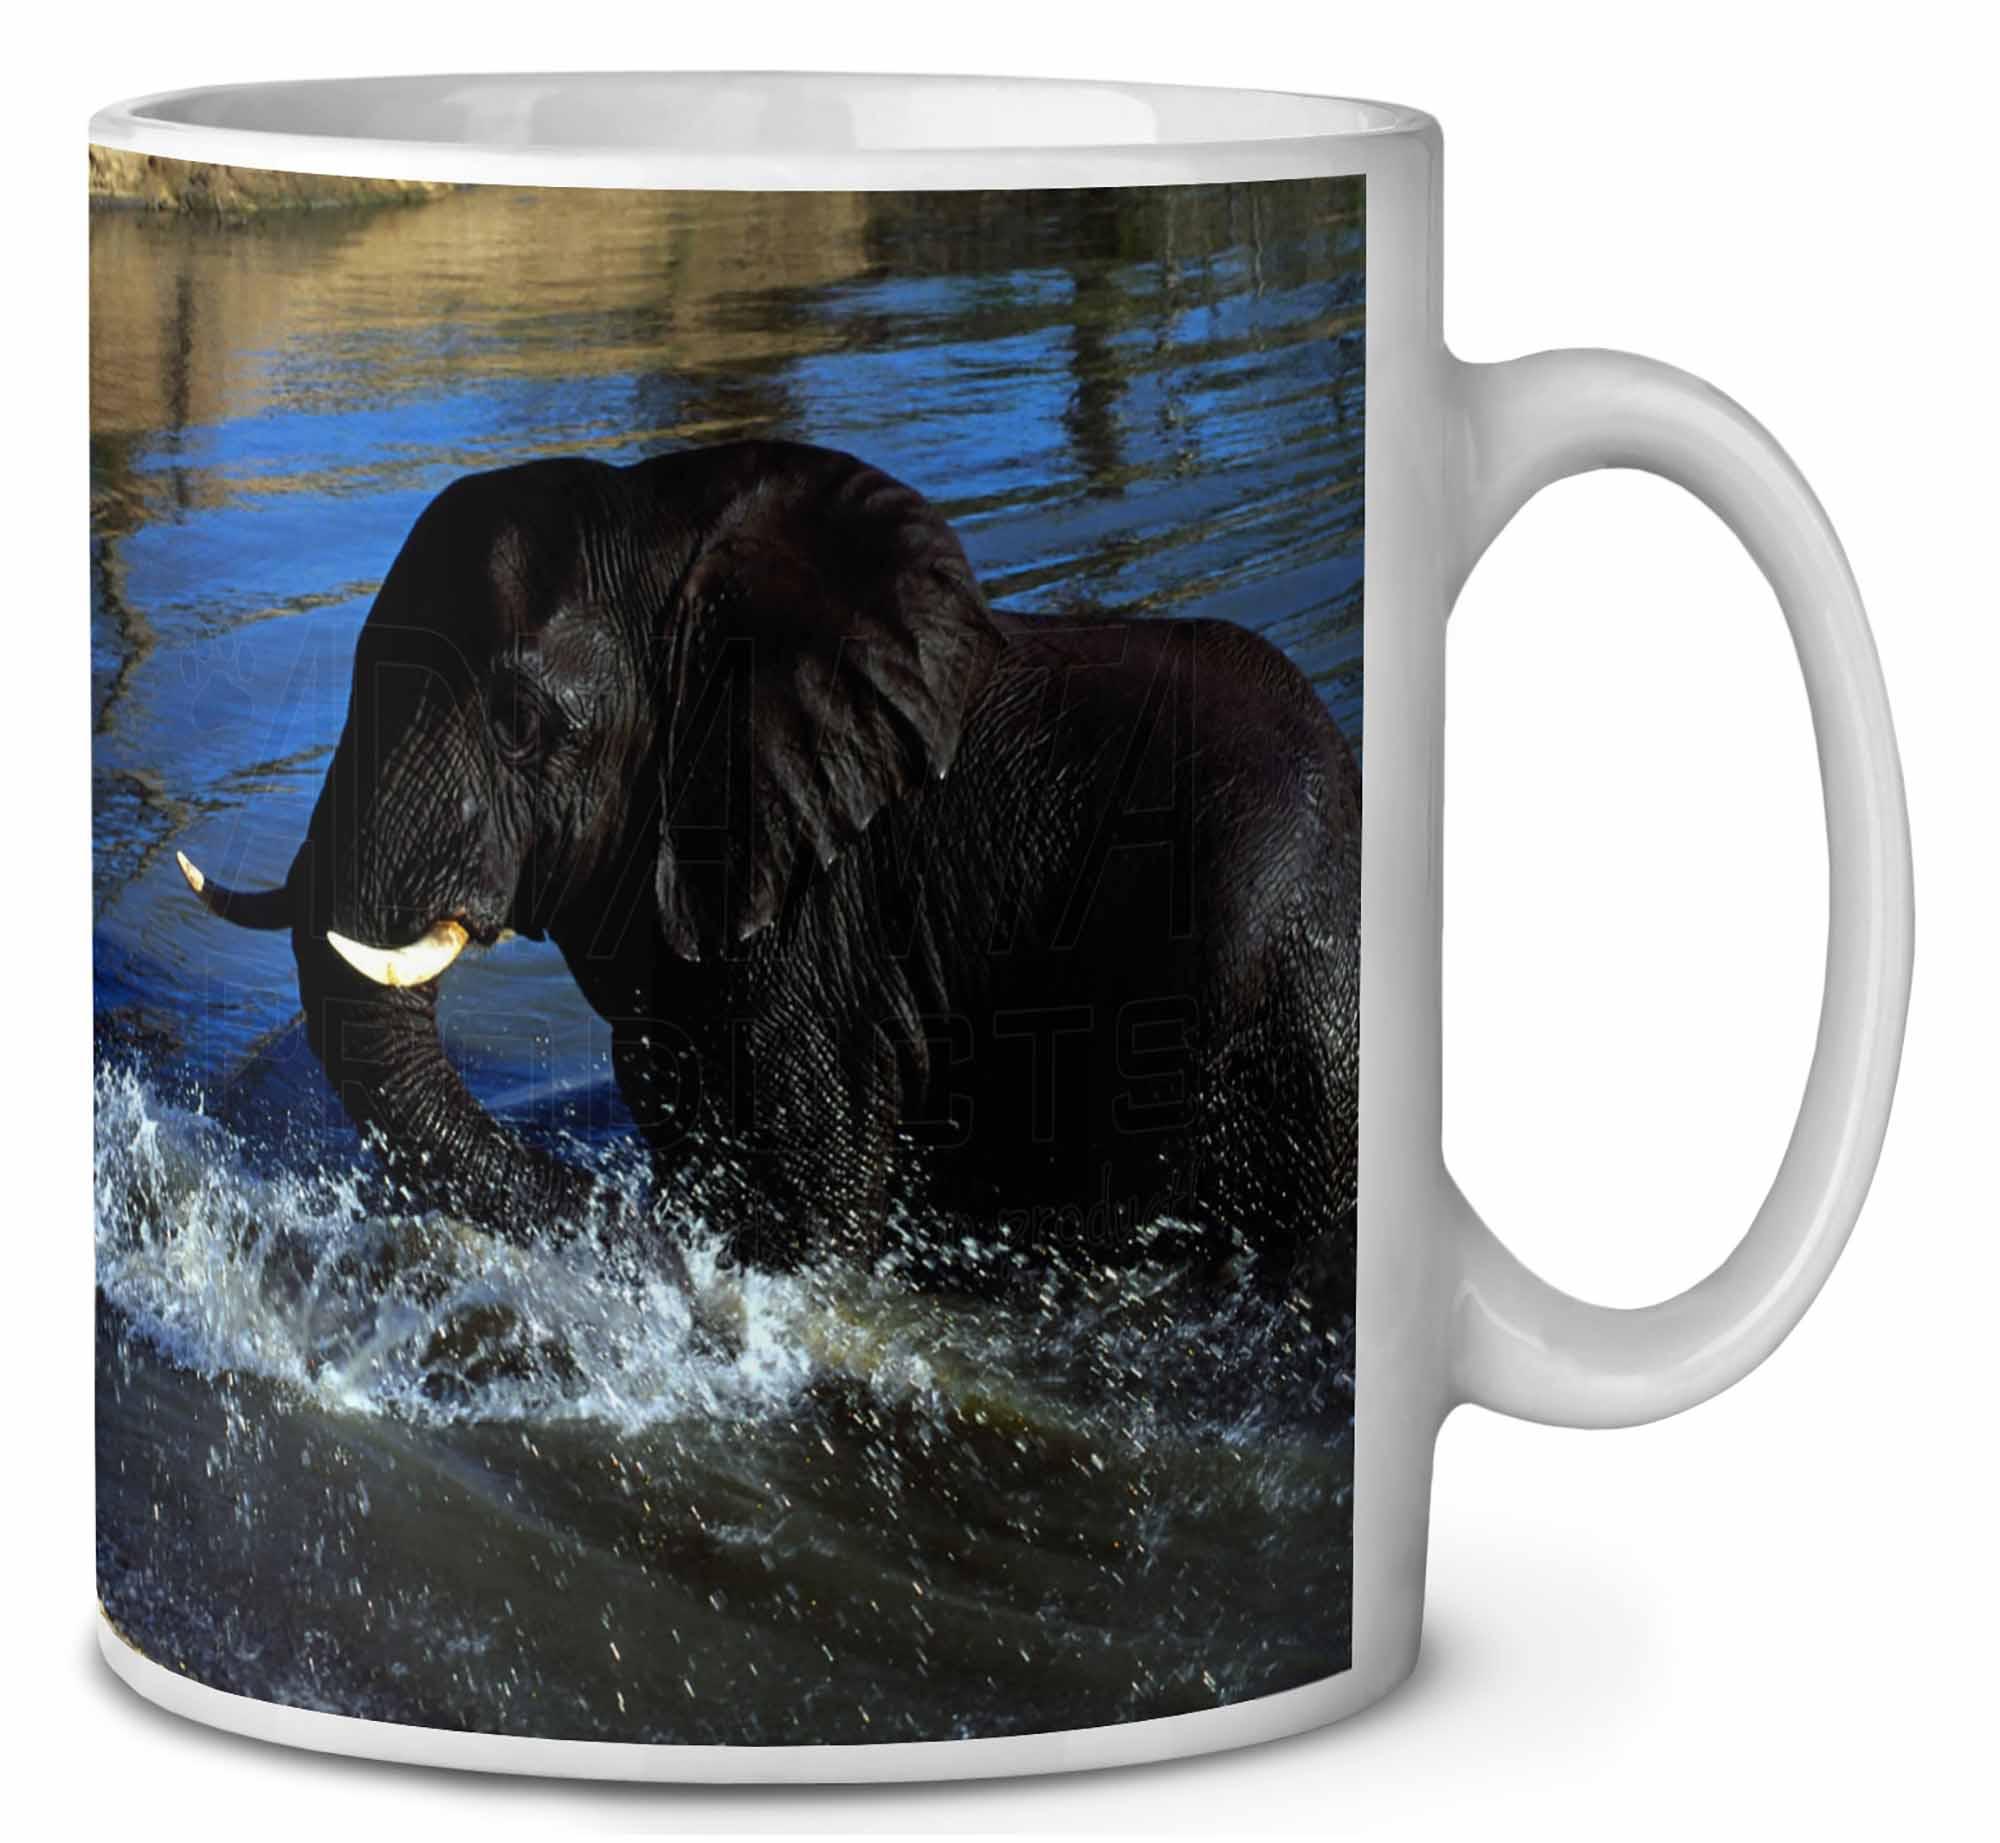 Personalised Mug BE A UNICORN Girls Cup Christmas Gift Stocking Filler Xmas KS68